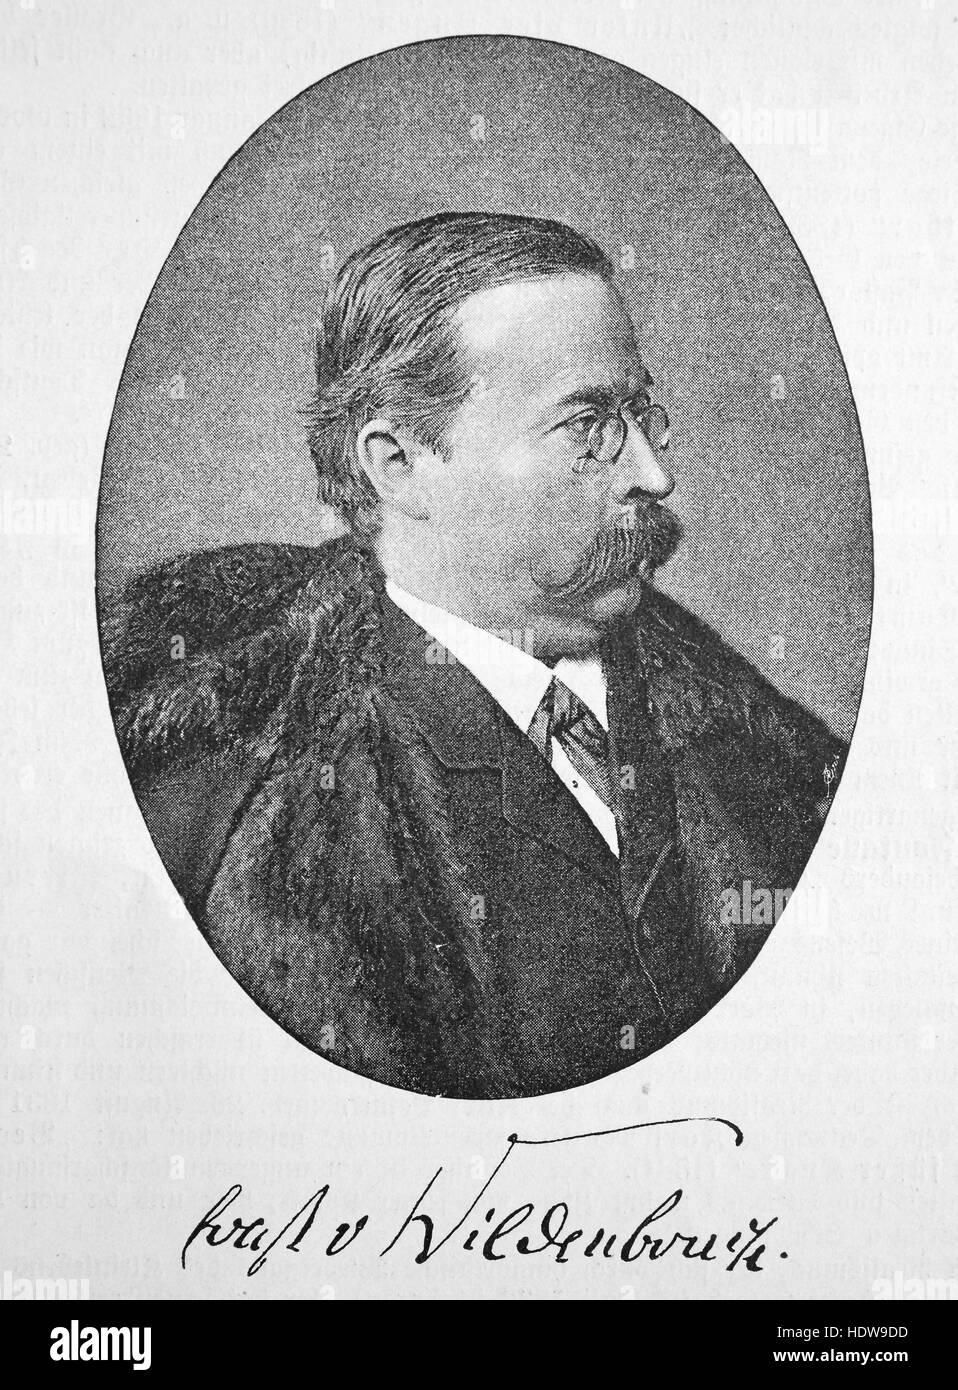 Ernst von Wildenbruch, 1845 - 1909, German poet and dramatist, woodcut from the year 1880 - Stock Image